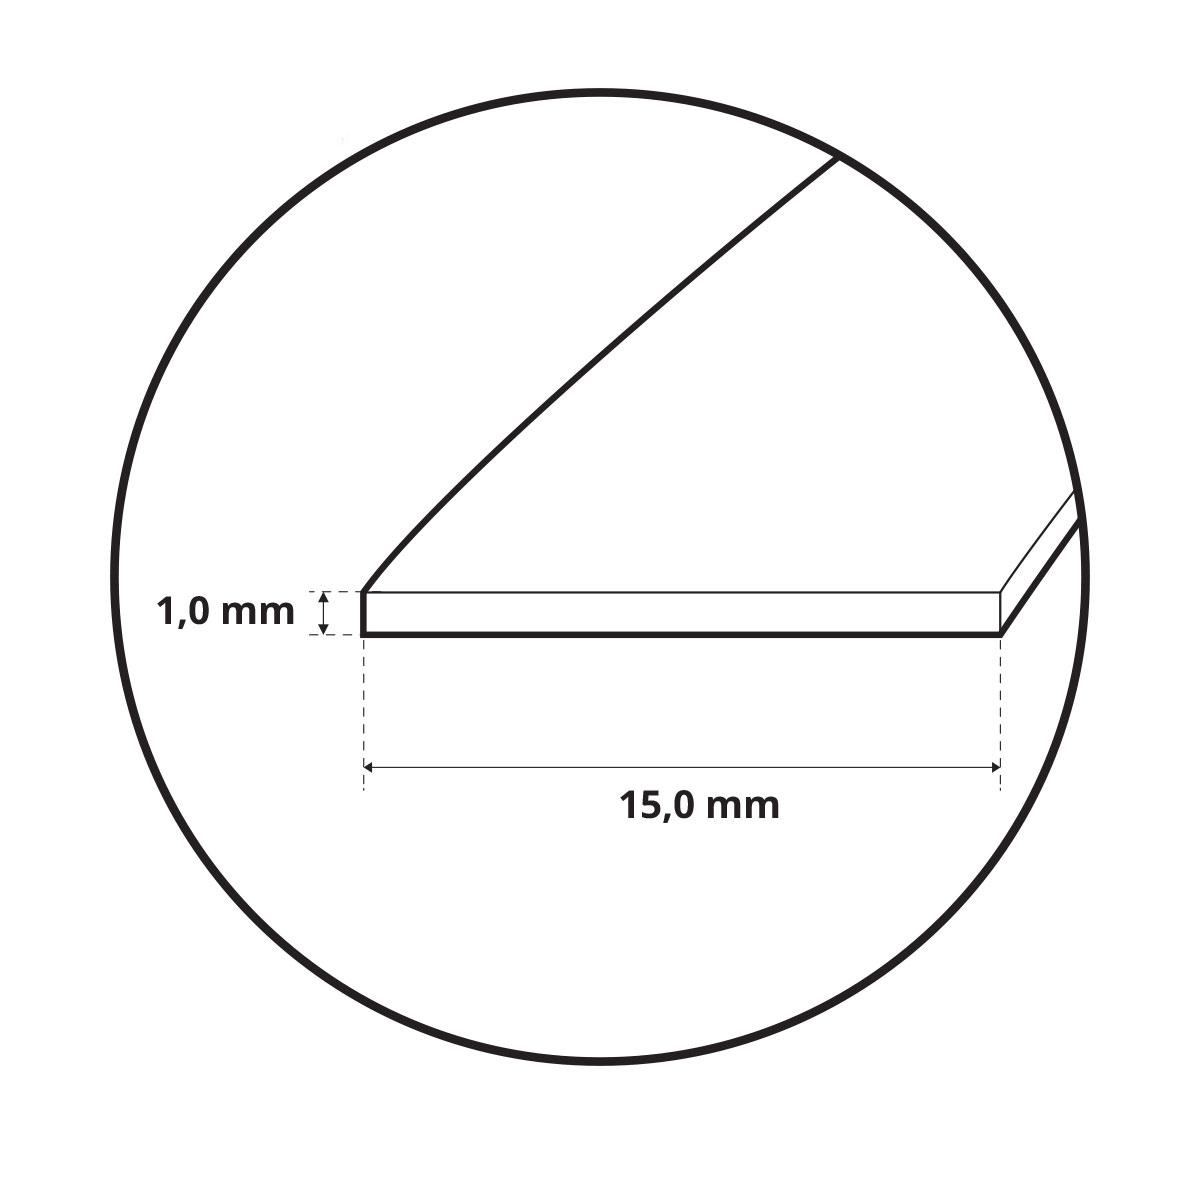 doppelseitiges acryl klebeband doppelklebeband montageklebeband montageband ebay. Black Bedroom Furniture Sets. Home Design Ideas